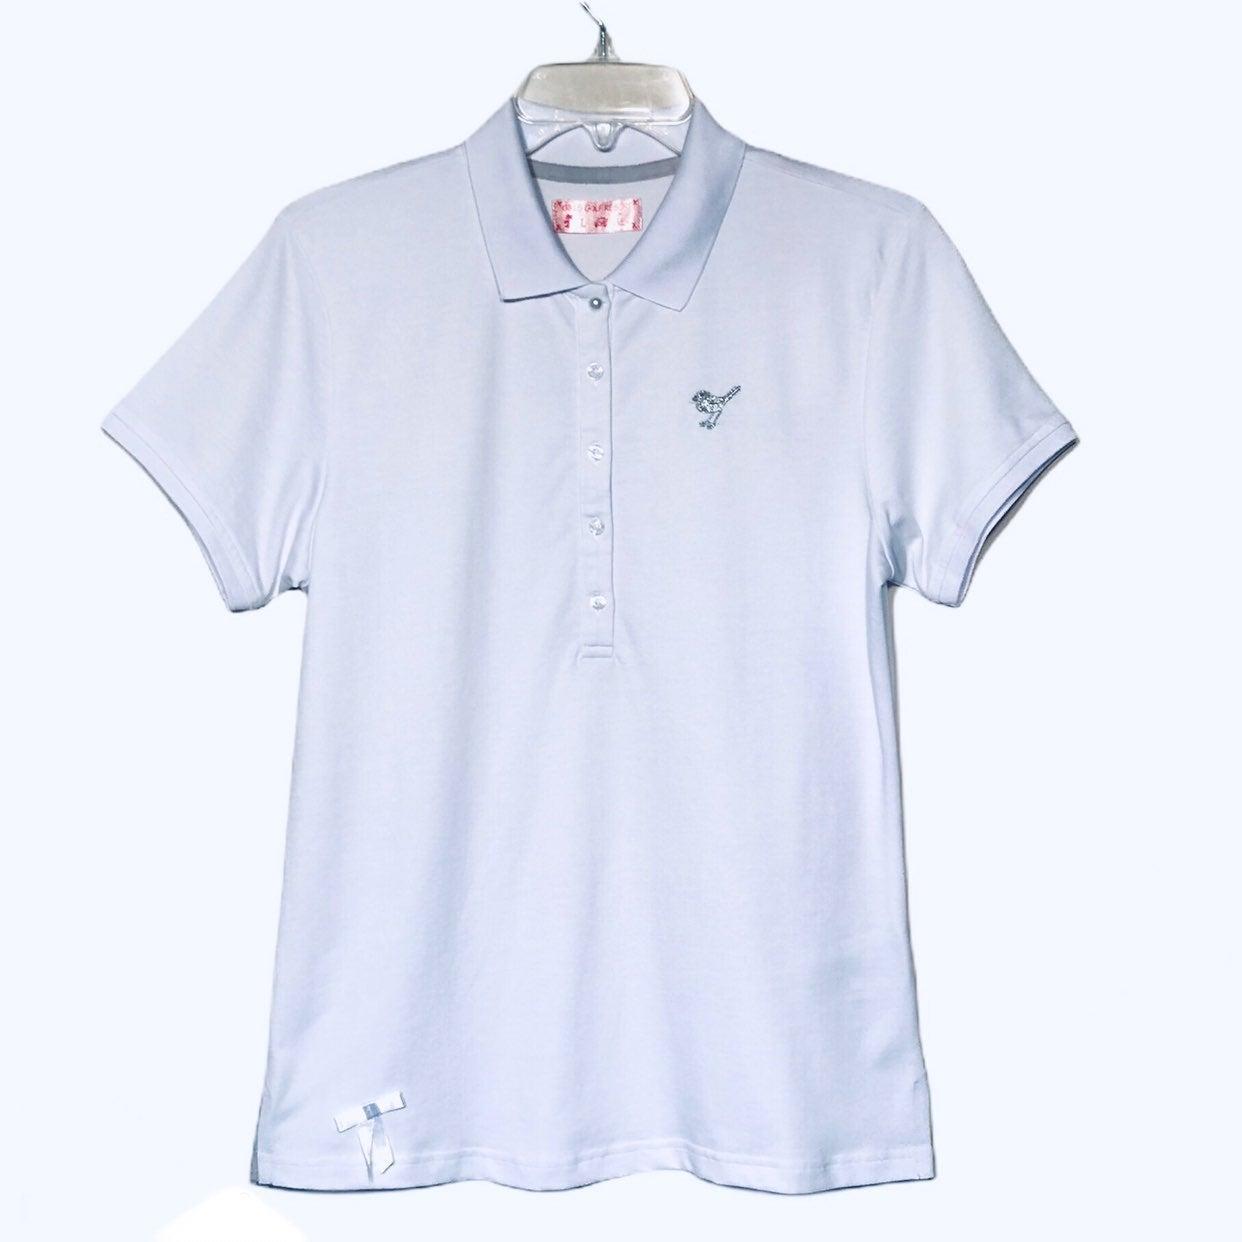 Girls Golf Short Sleeve White Golf Top